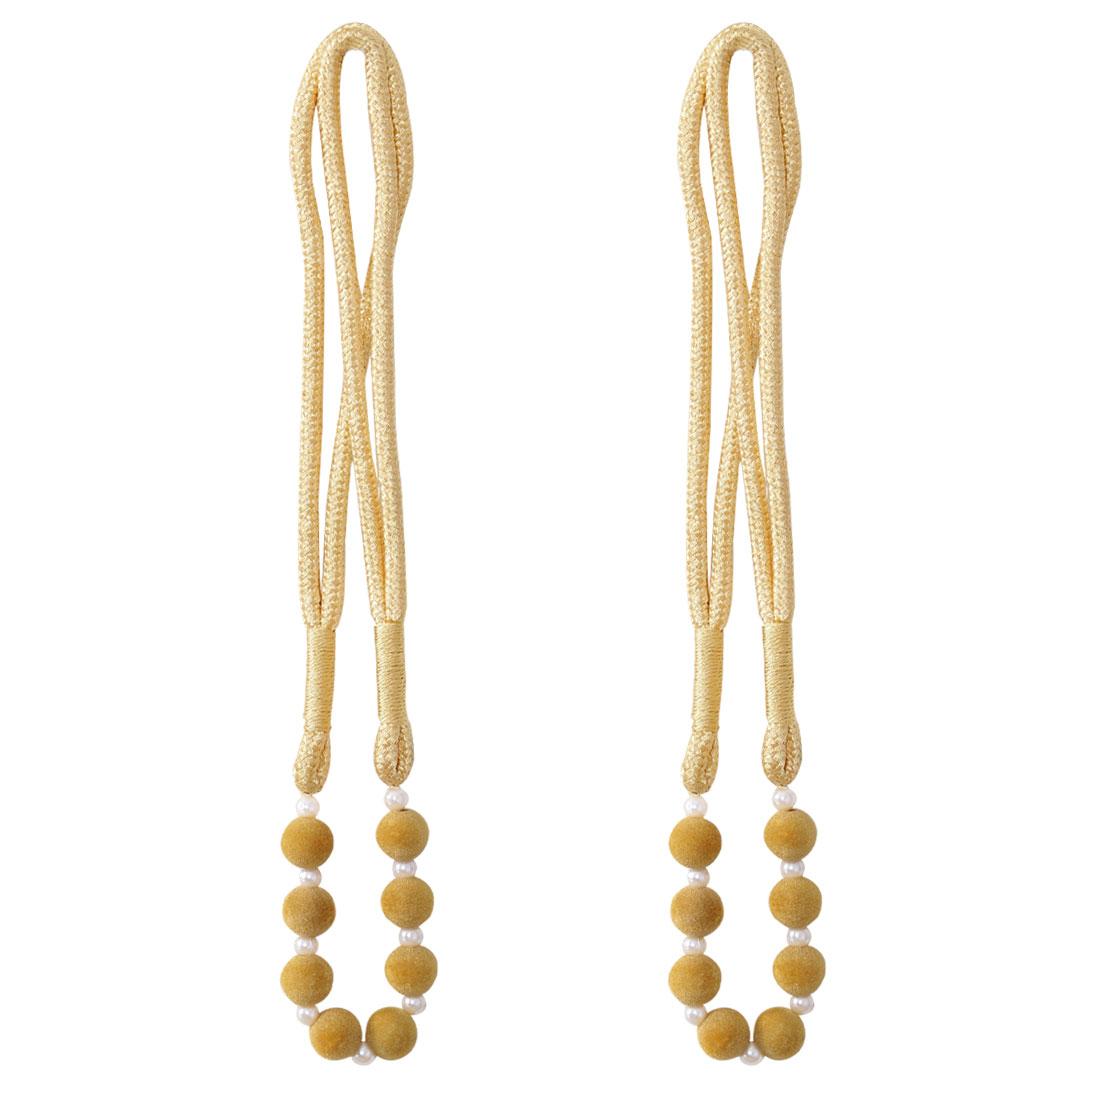 2pcs Curtain Tiebacks 30 Inch Holdback Decorative Rope Tassel Holder, Yellow